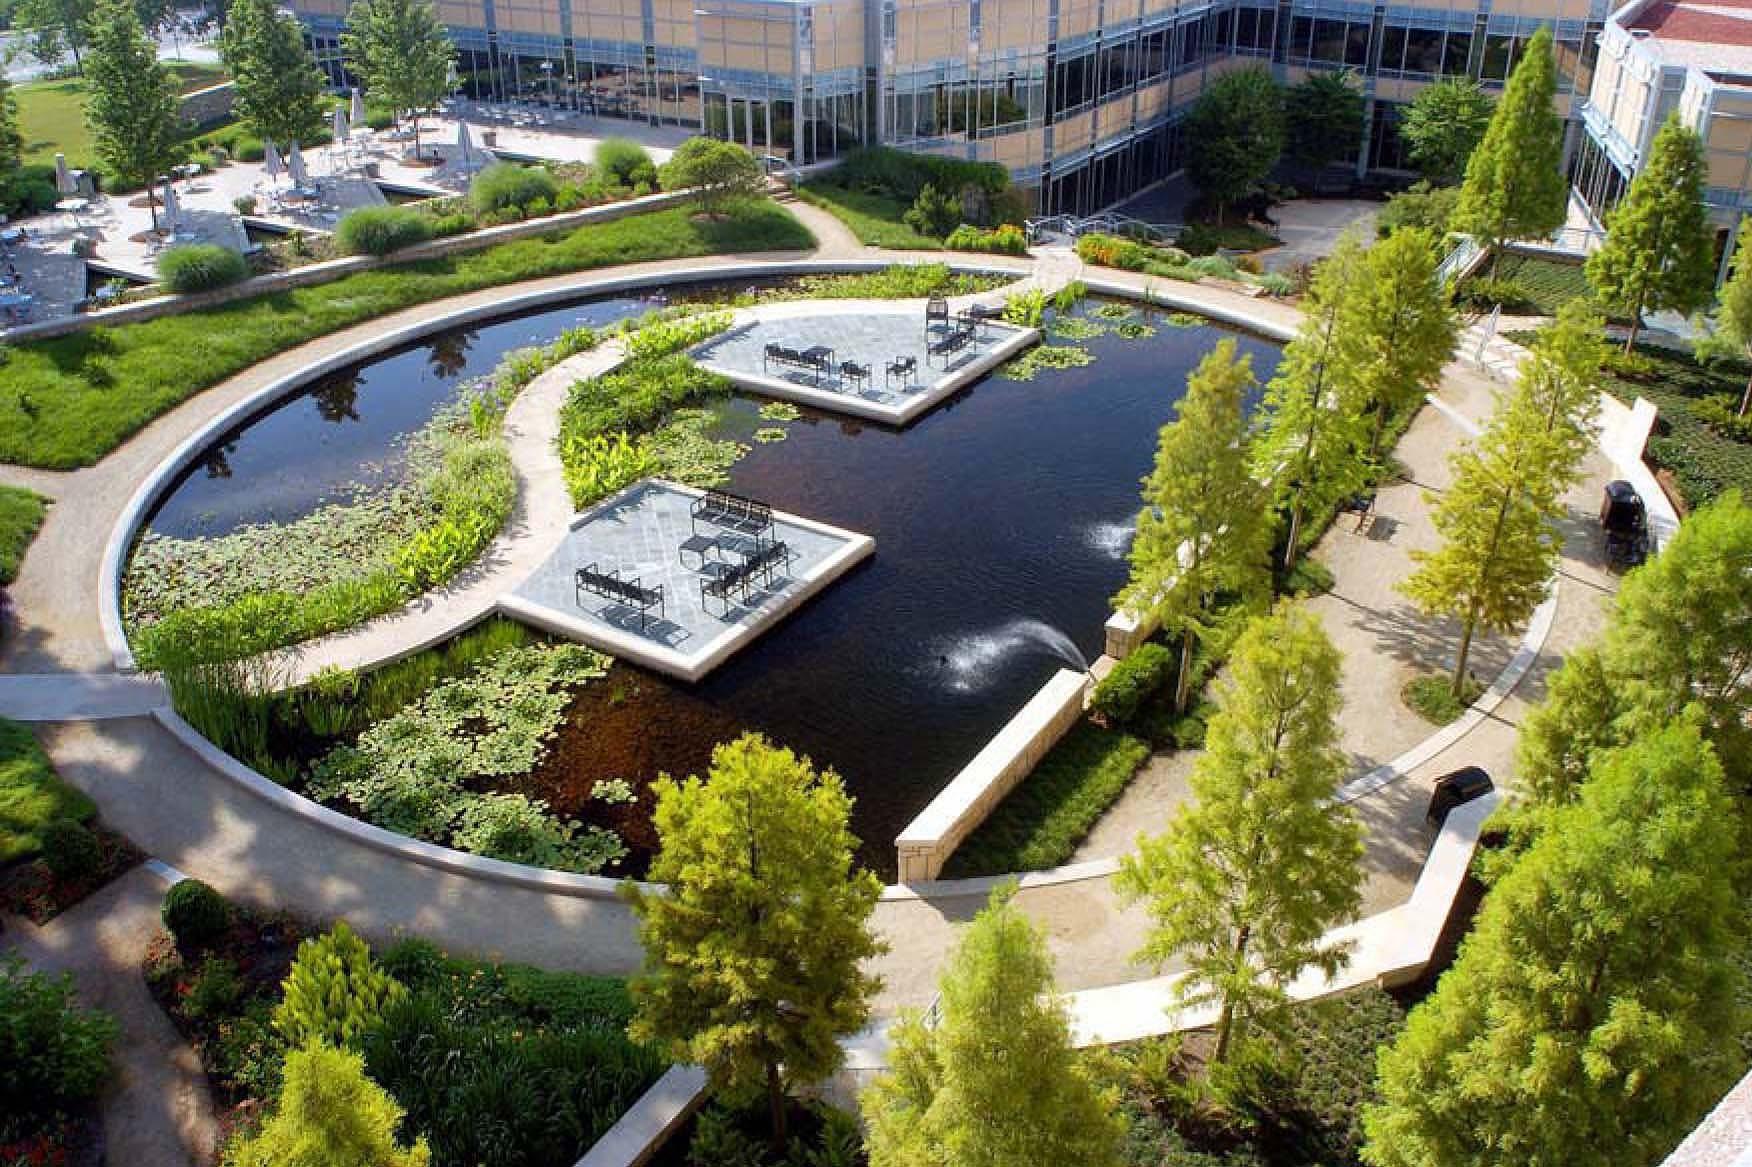 Landscape Architecture Design  Schools fering Landscape Architecture Graduate Programs